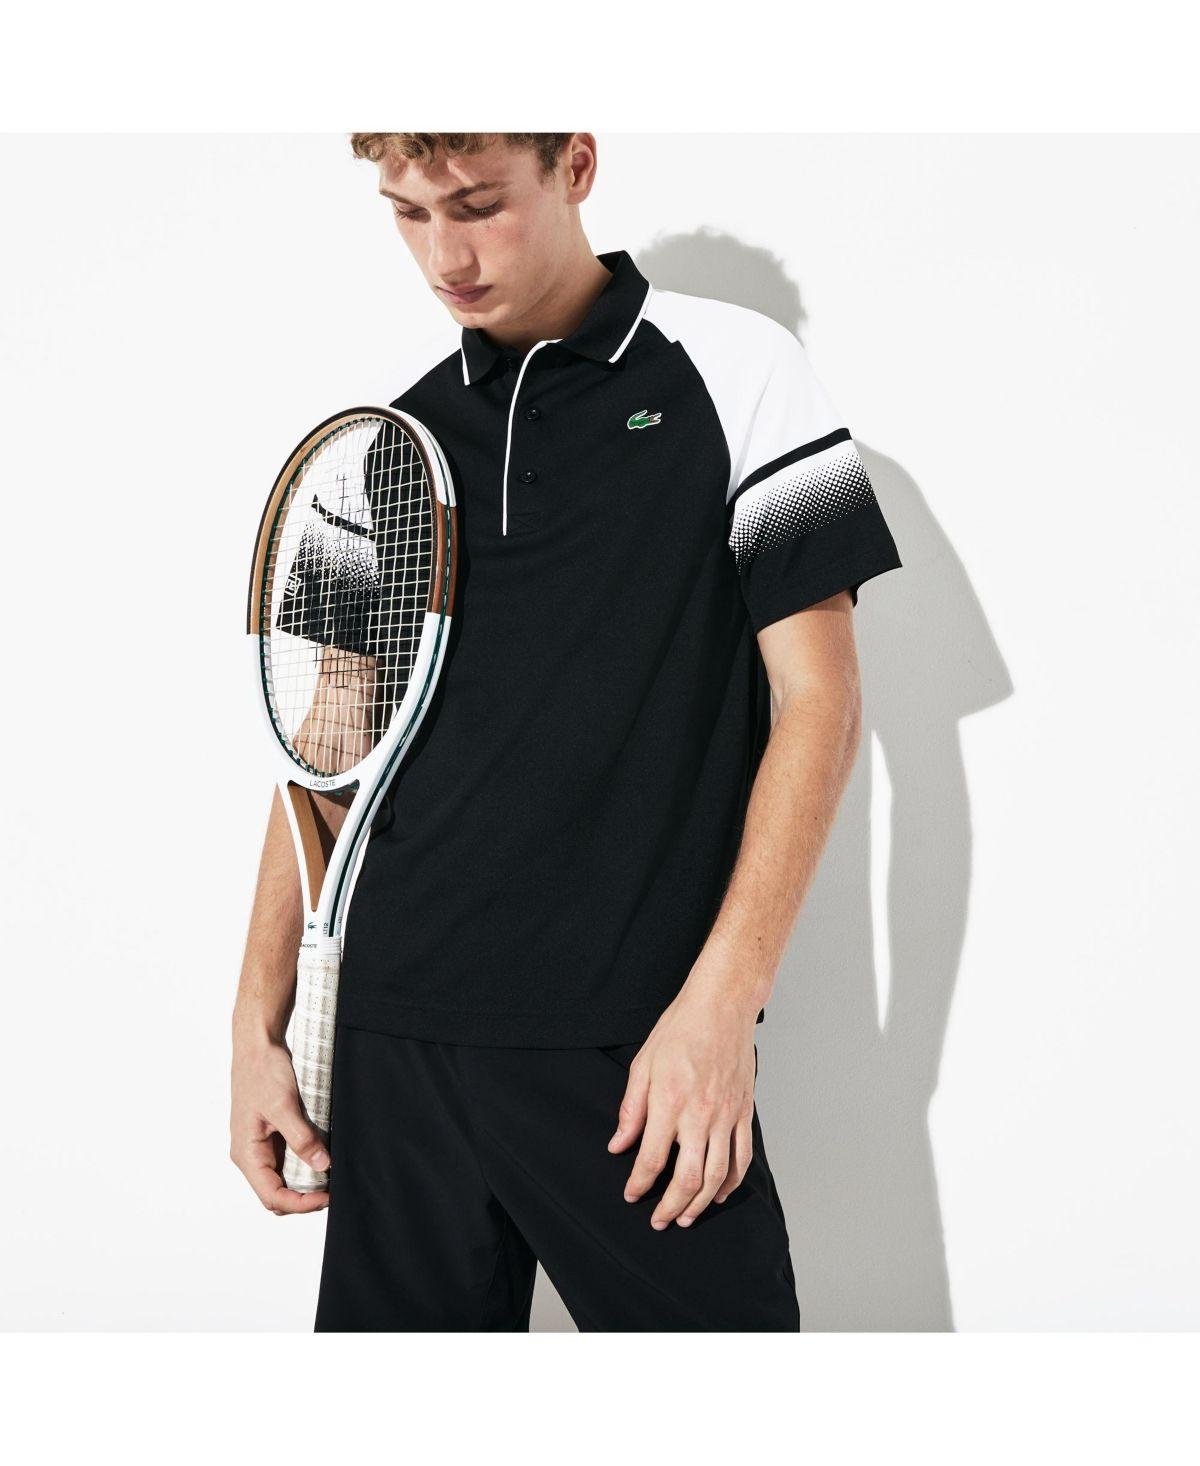 Lacoste Men S Sport Ultra Dry Gradient Polo Shirt Black Lacoste Men Lacoste Sport Lacoste